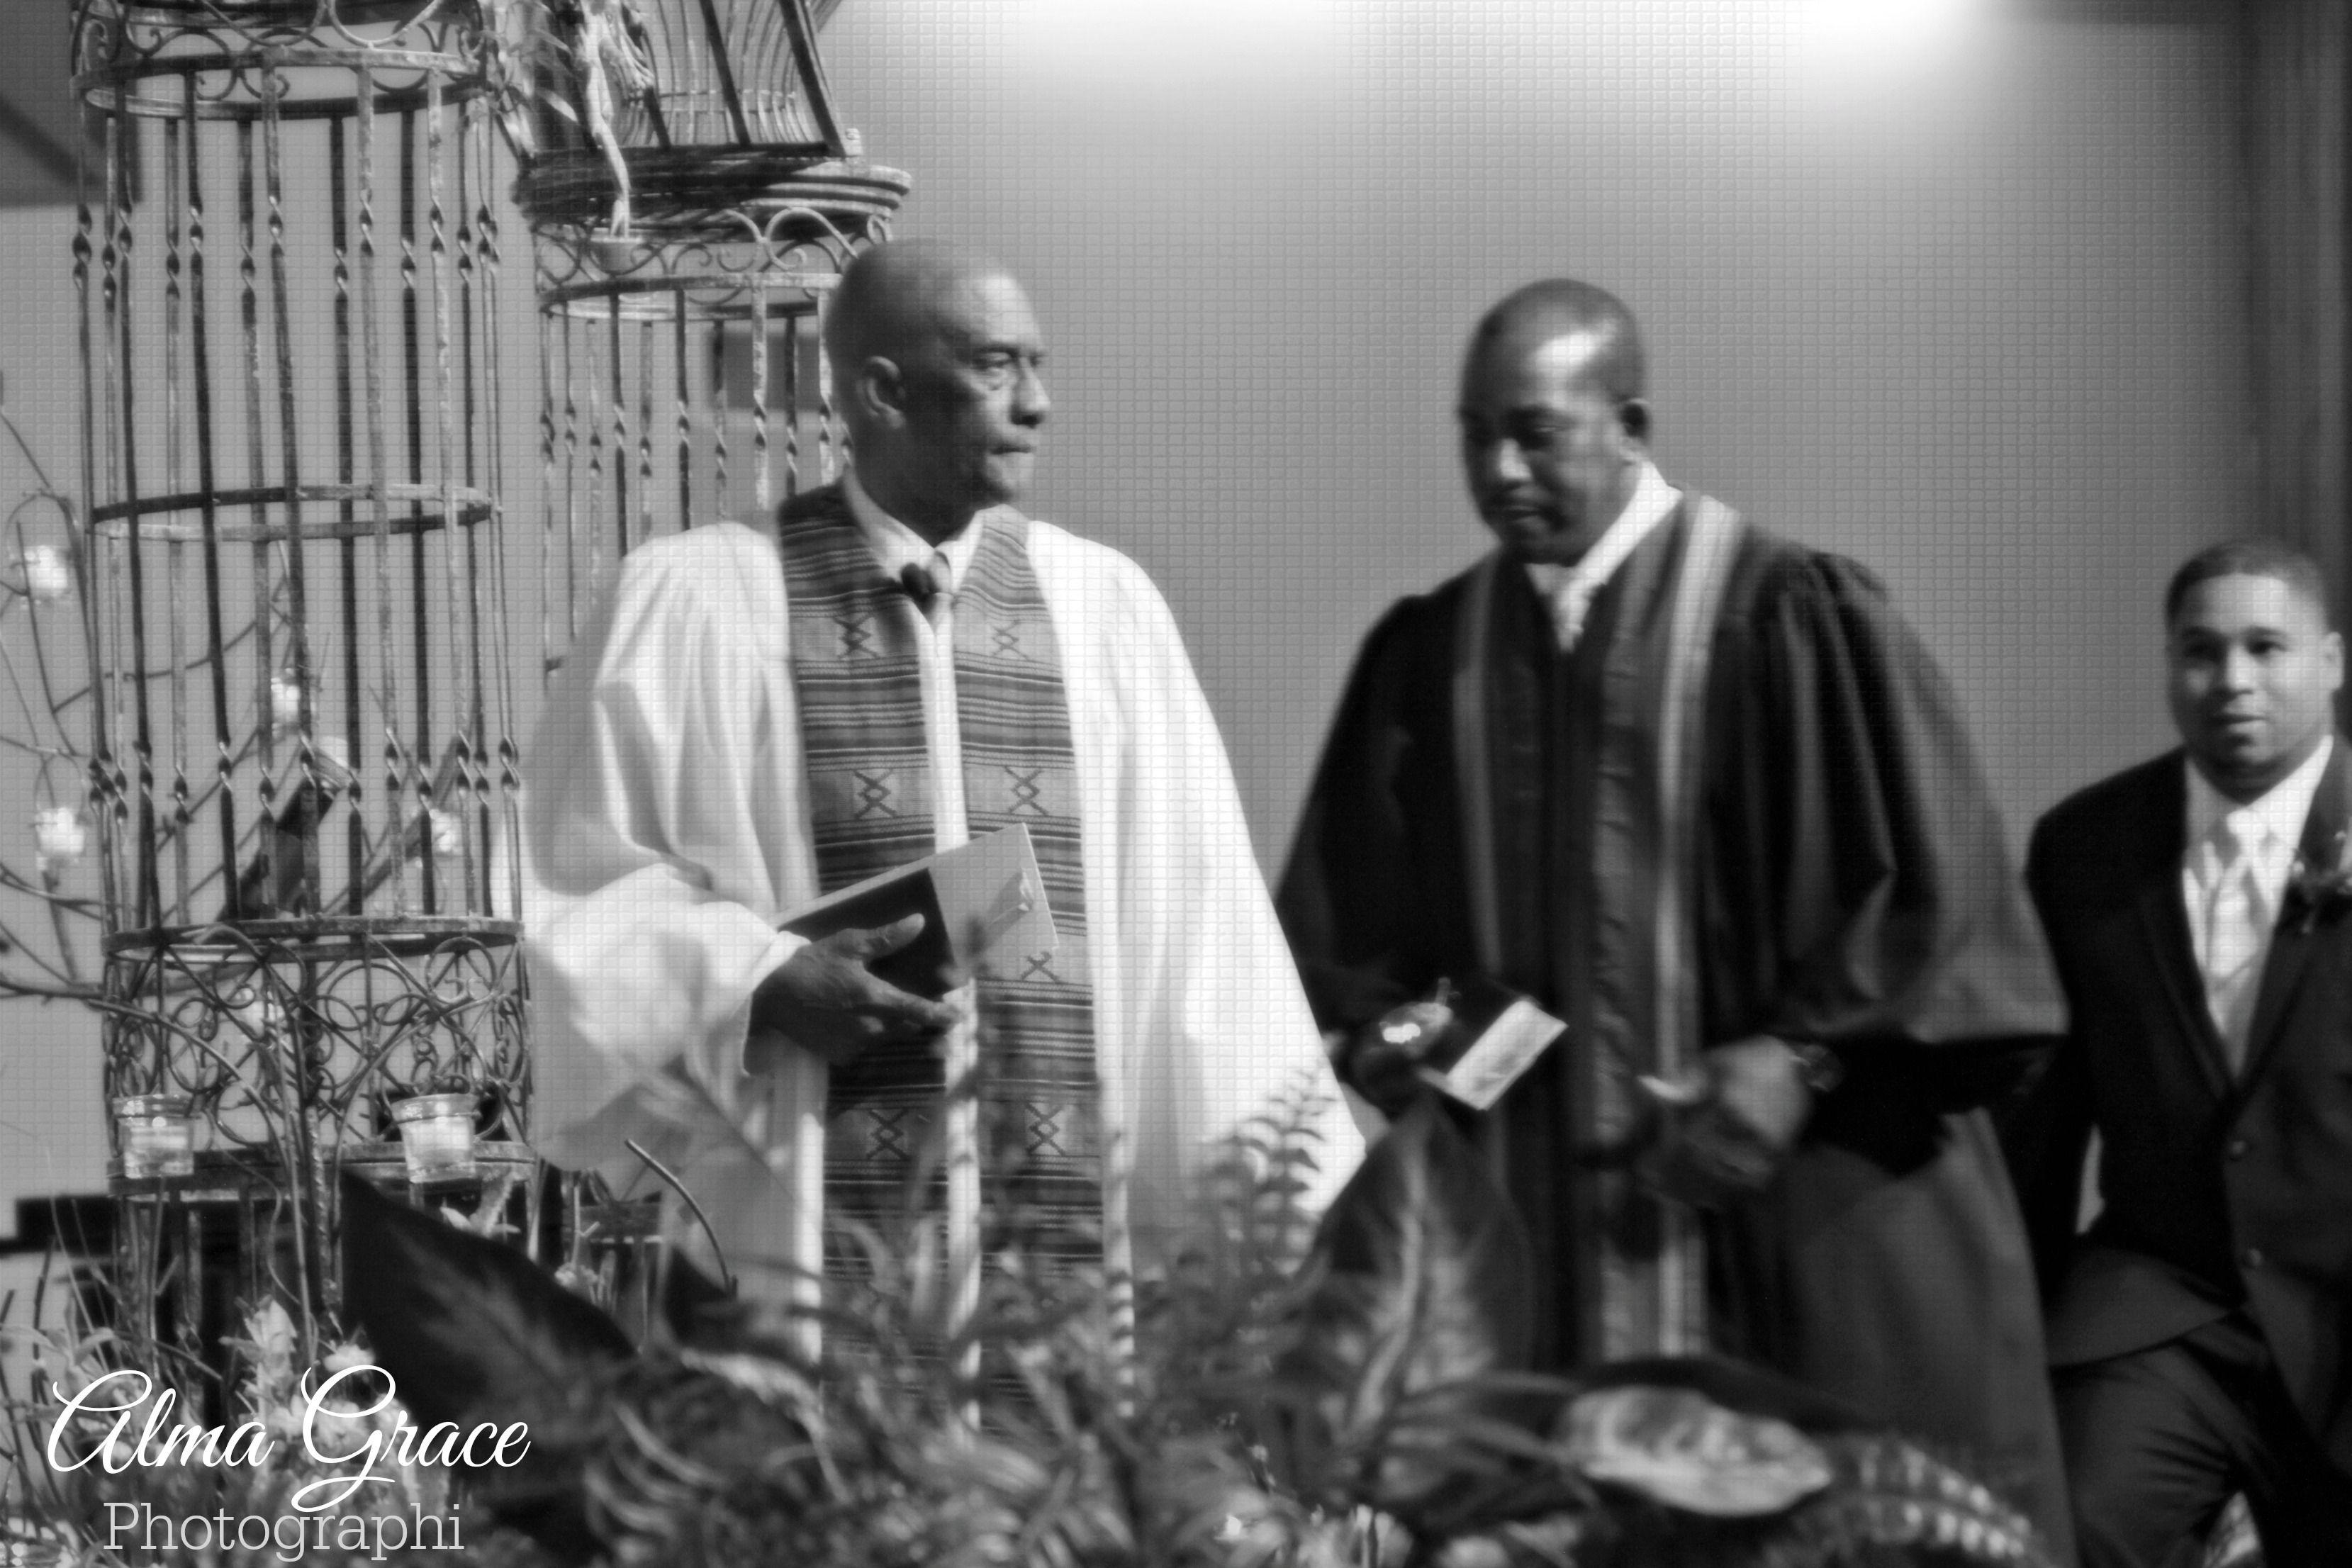 www.facebook.com/almagracephotographi  Two Pastors & a groom.